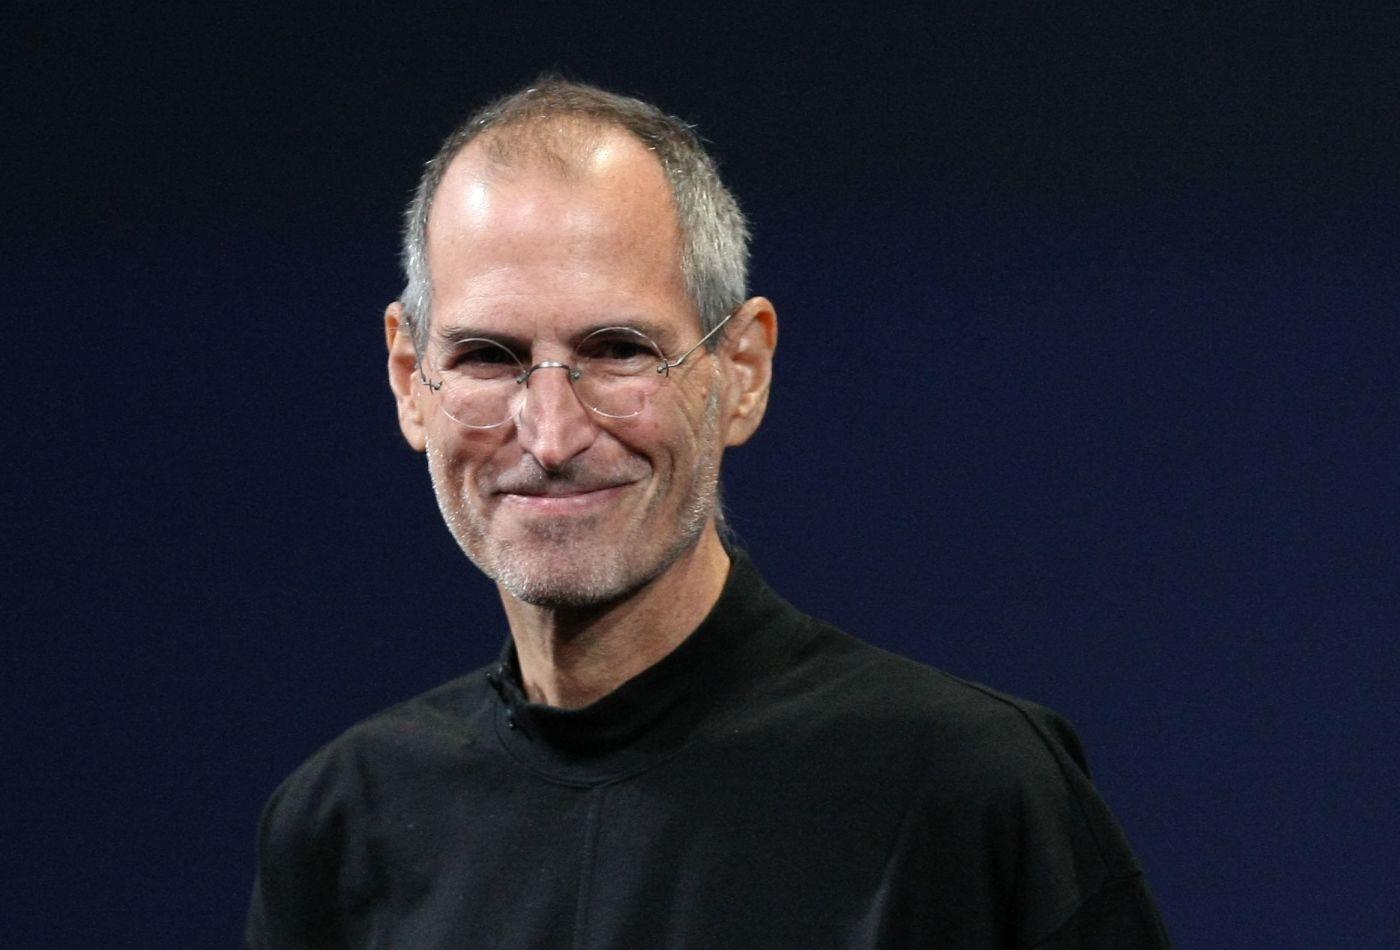 Steve_Jobs_WLTH